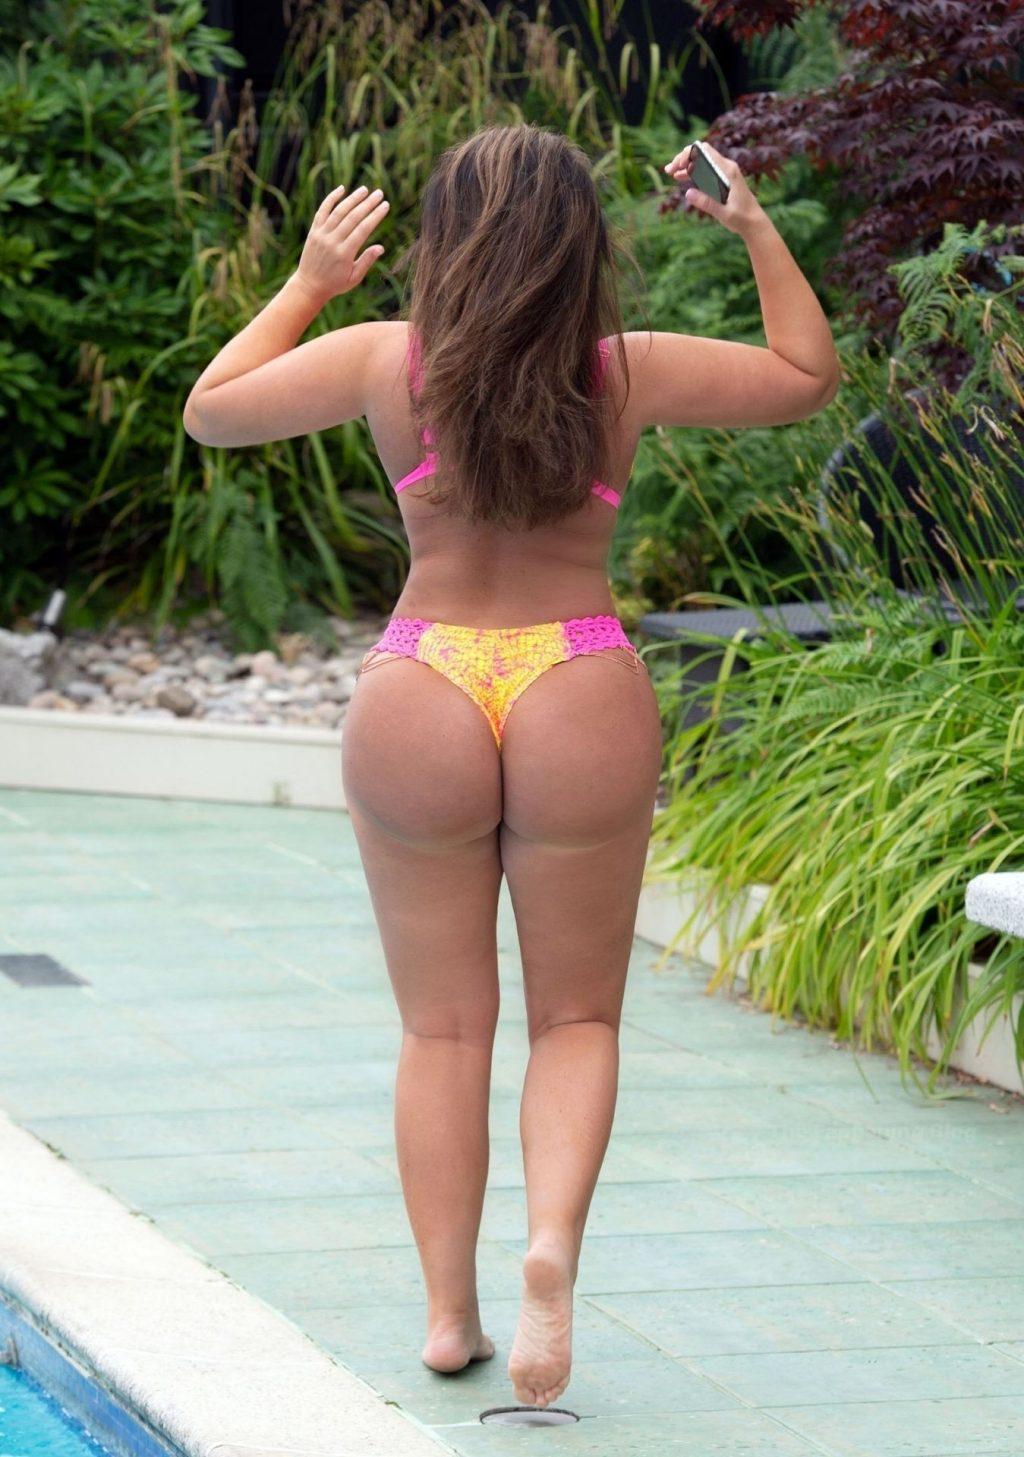 Lauren Goodger is Seen Wearing an Orange a Yellow and Pink Bikini in Kent (12 Photos)